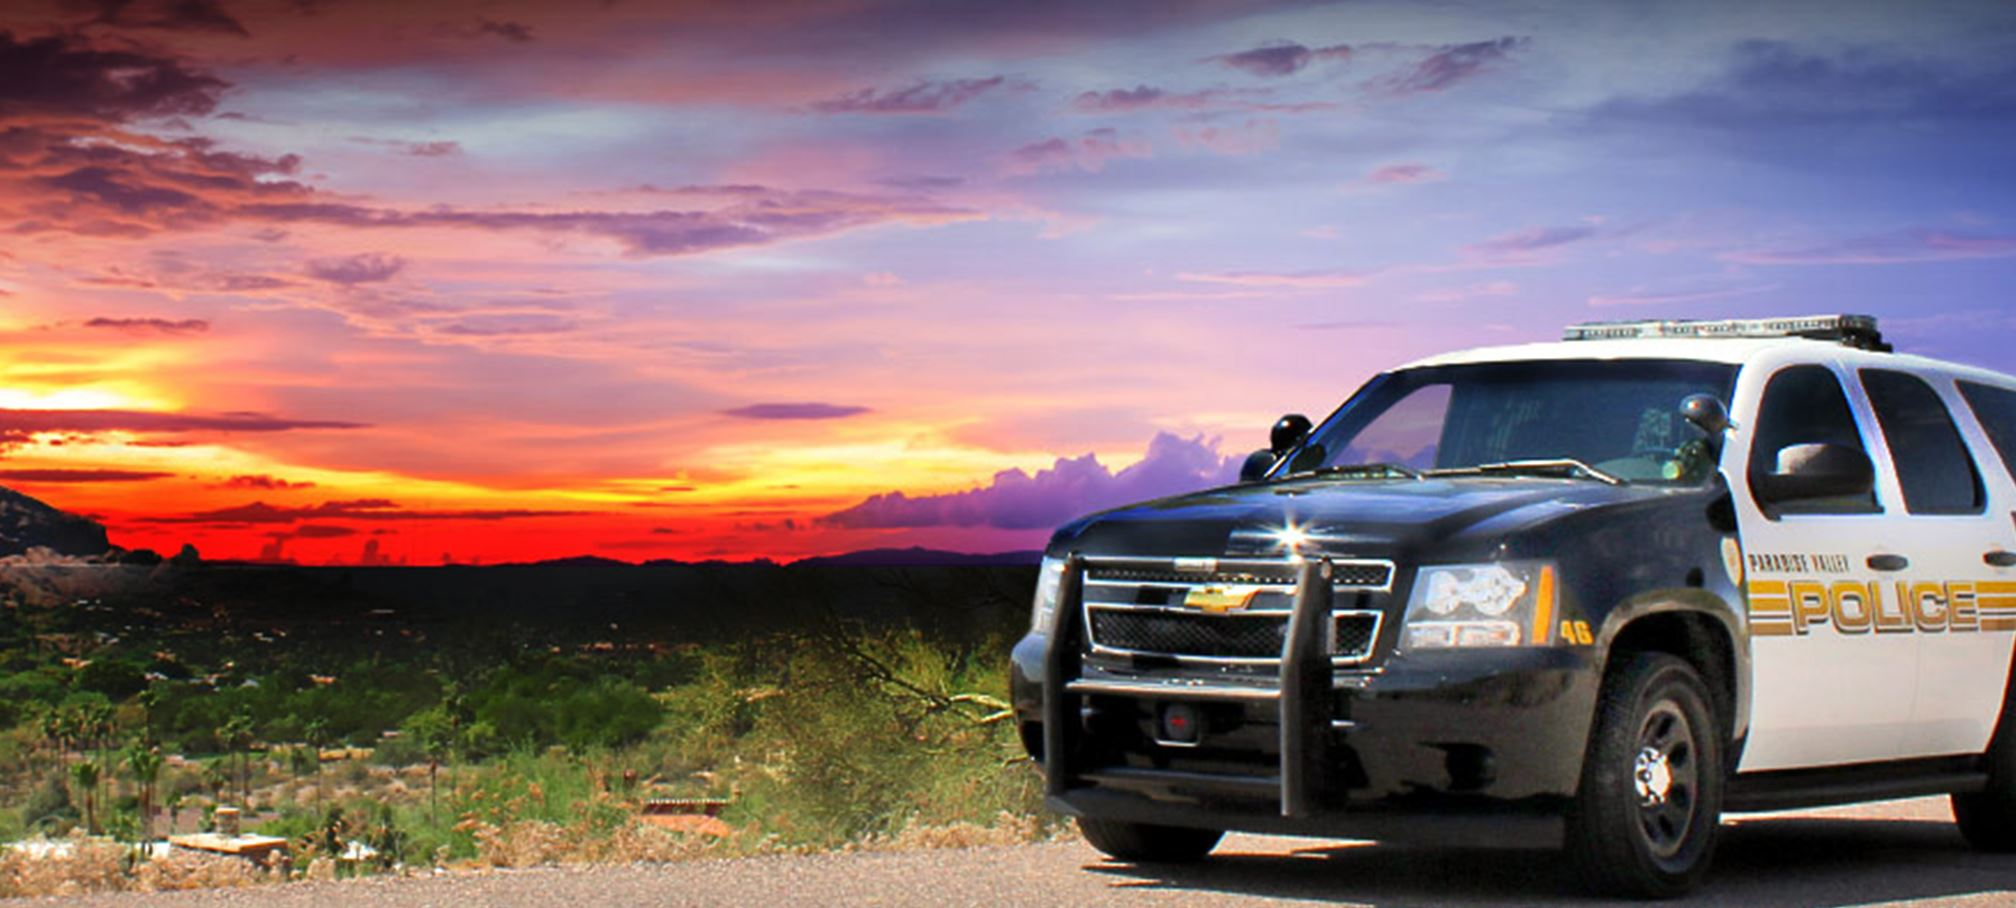 Police   Paradise Valley, AZ - Official Website